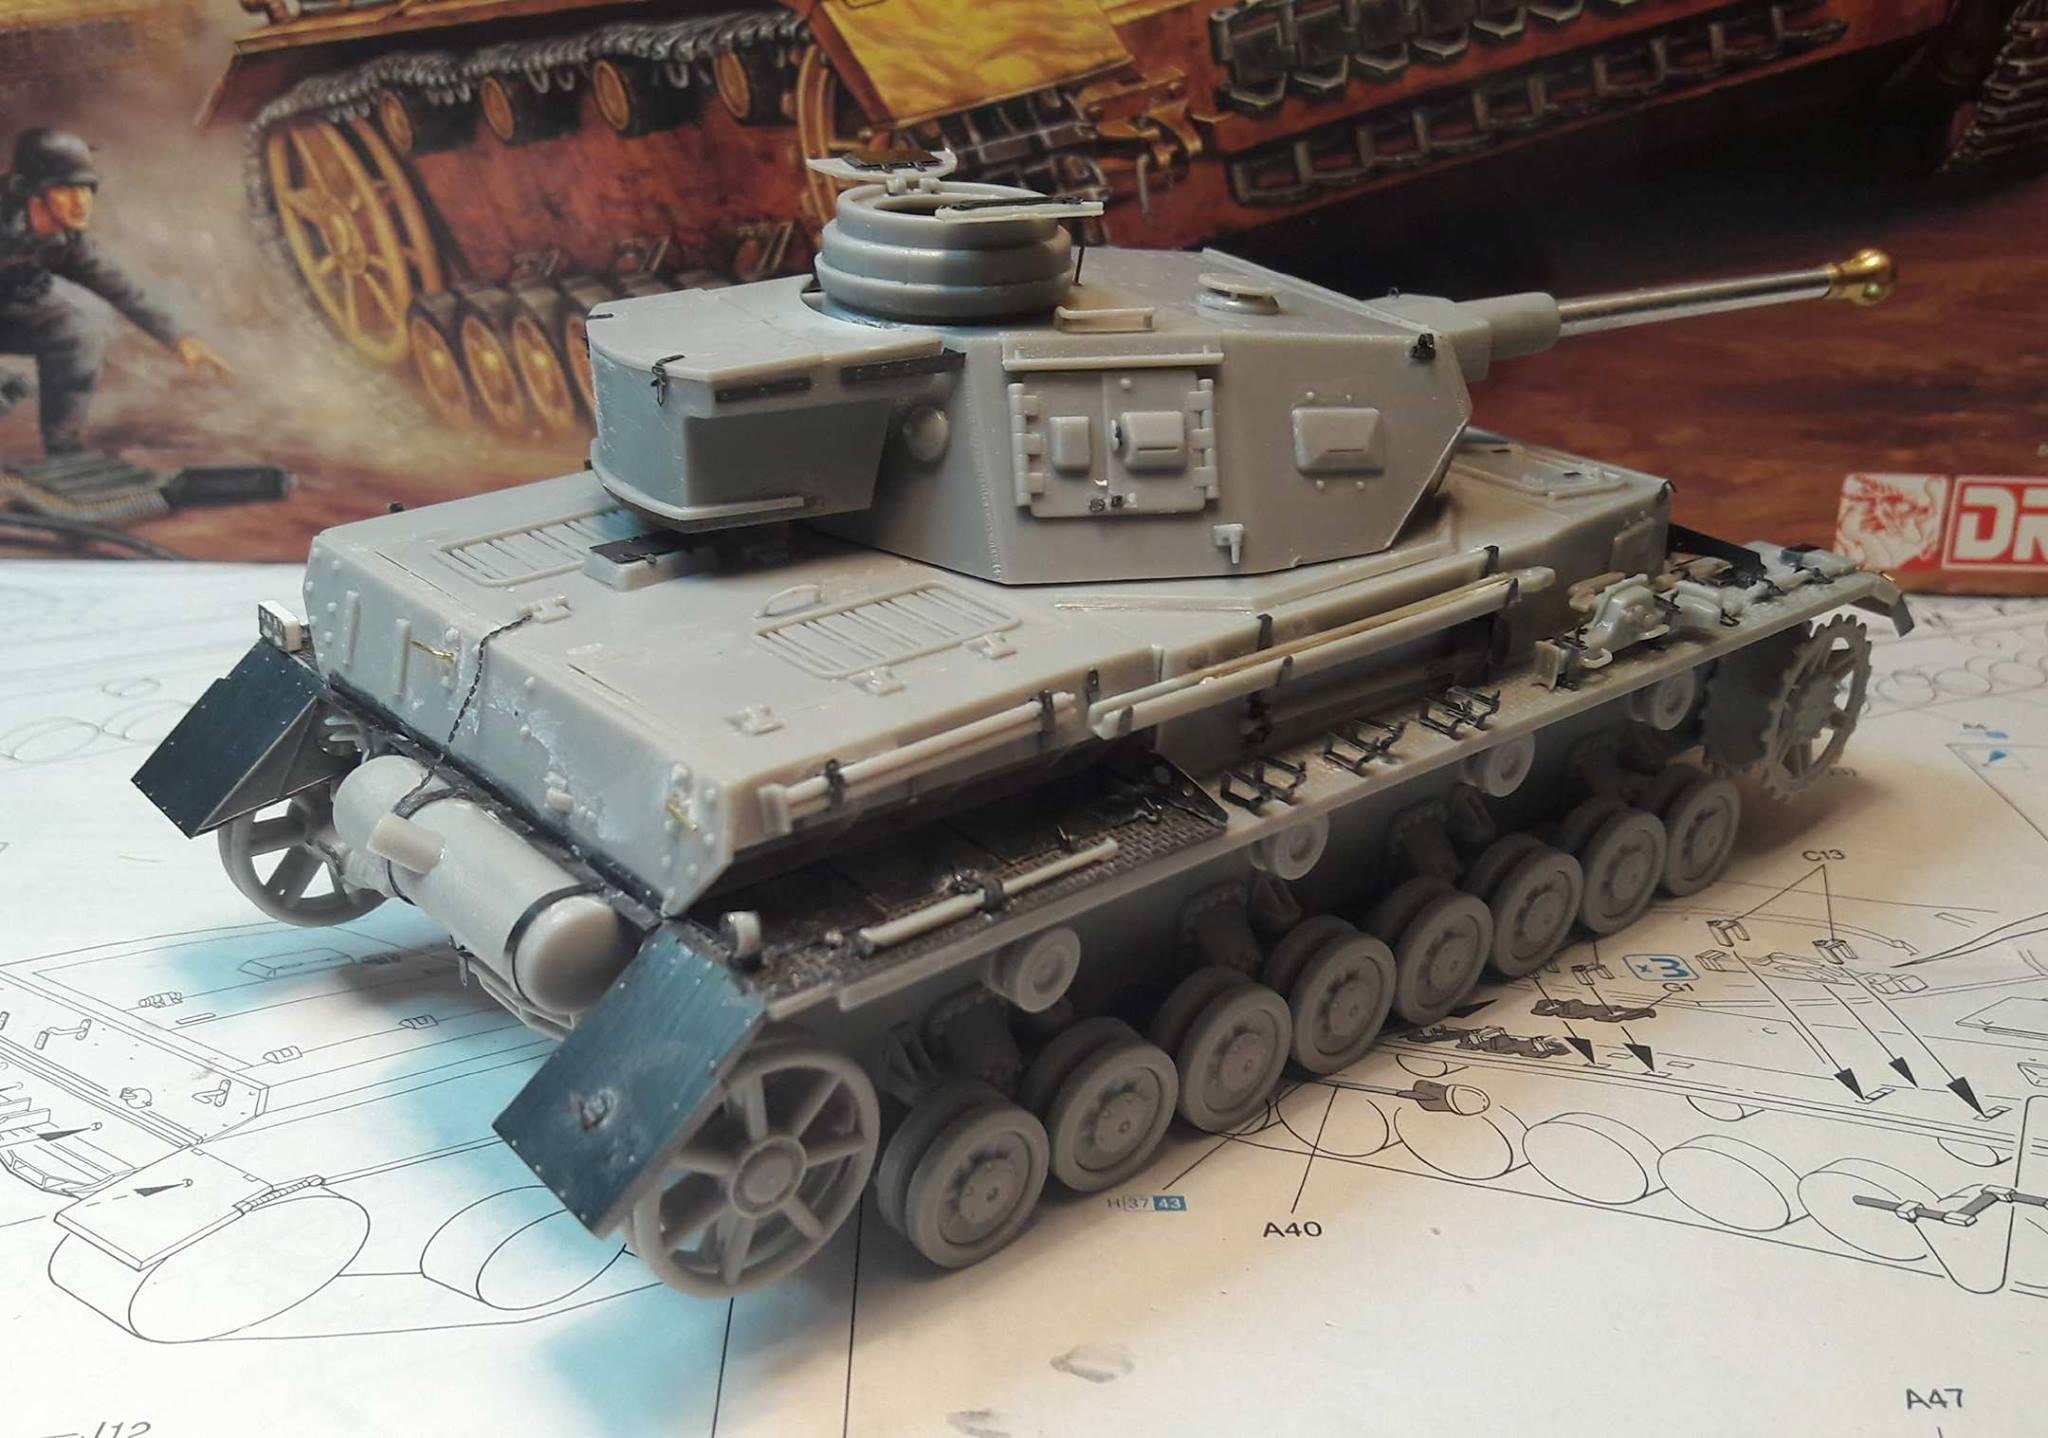 PzKpfw. IV Ausf. F2 - Dragon - Page 2 9667422117118710212191408714962829297853o